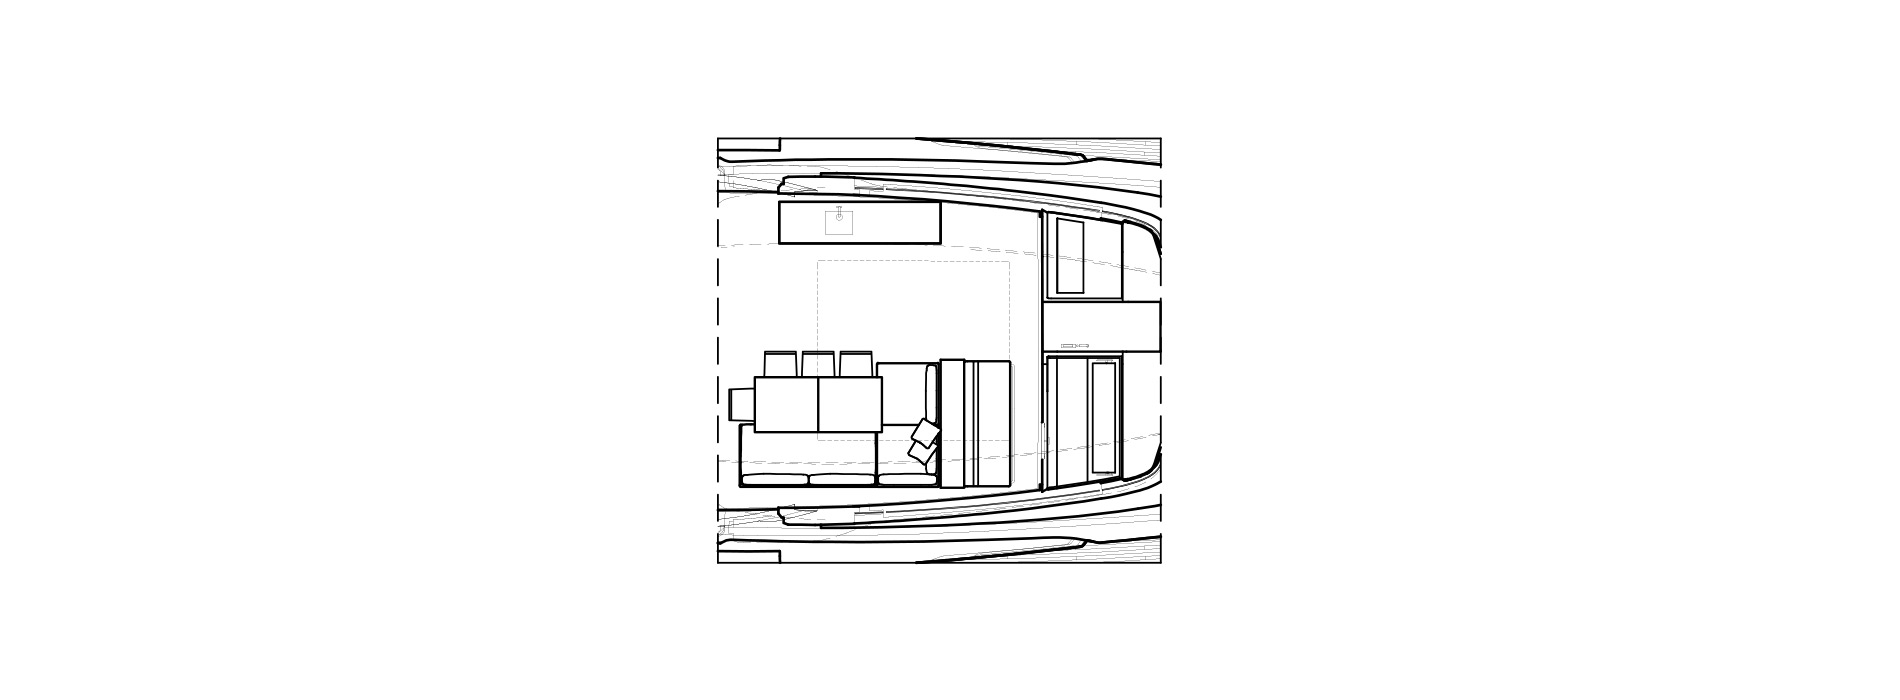 Sanlorenzo Yachts SX88 细节 Versione USA